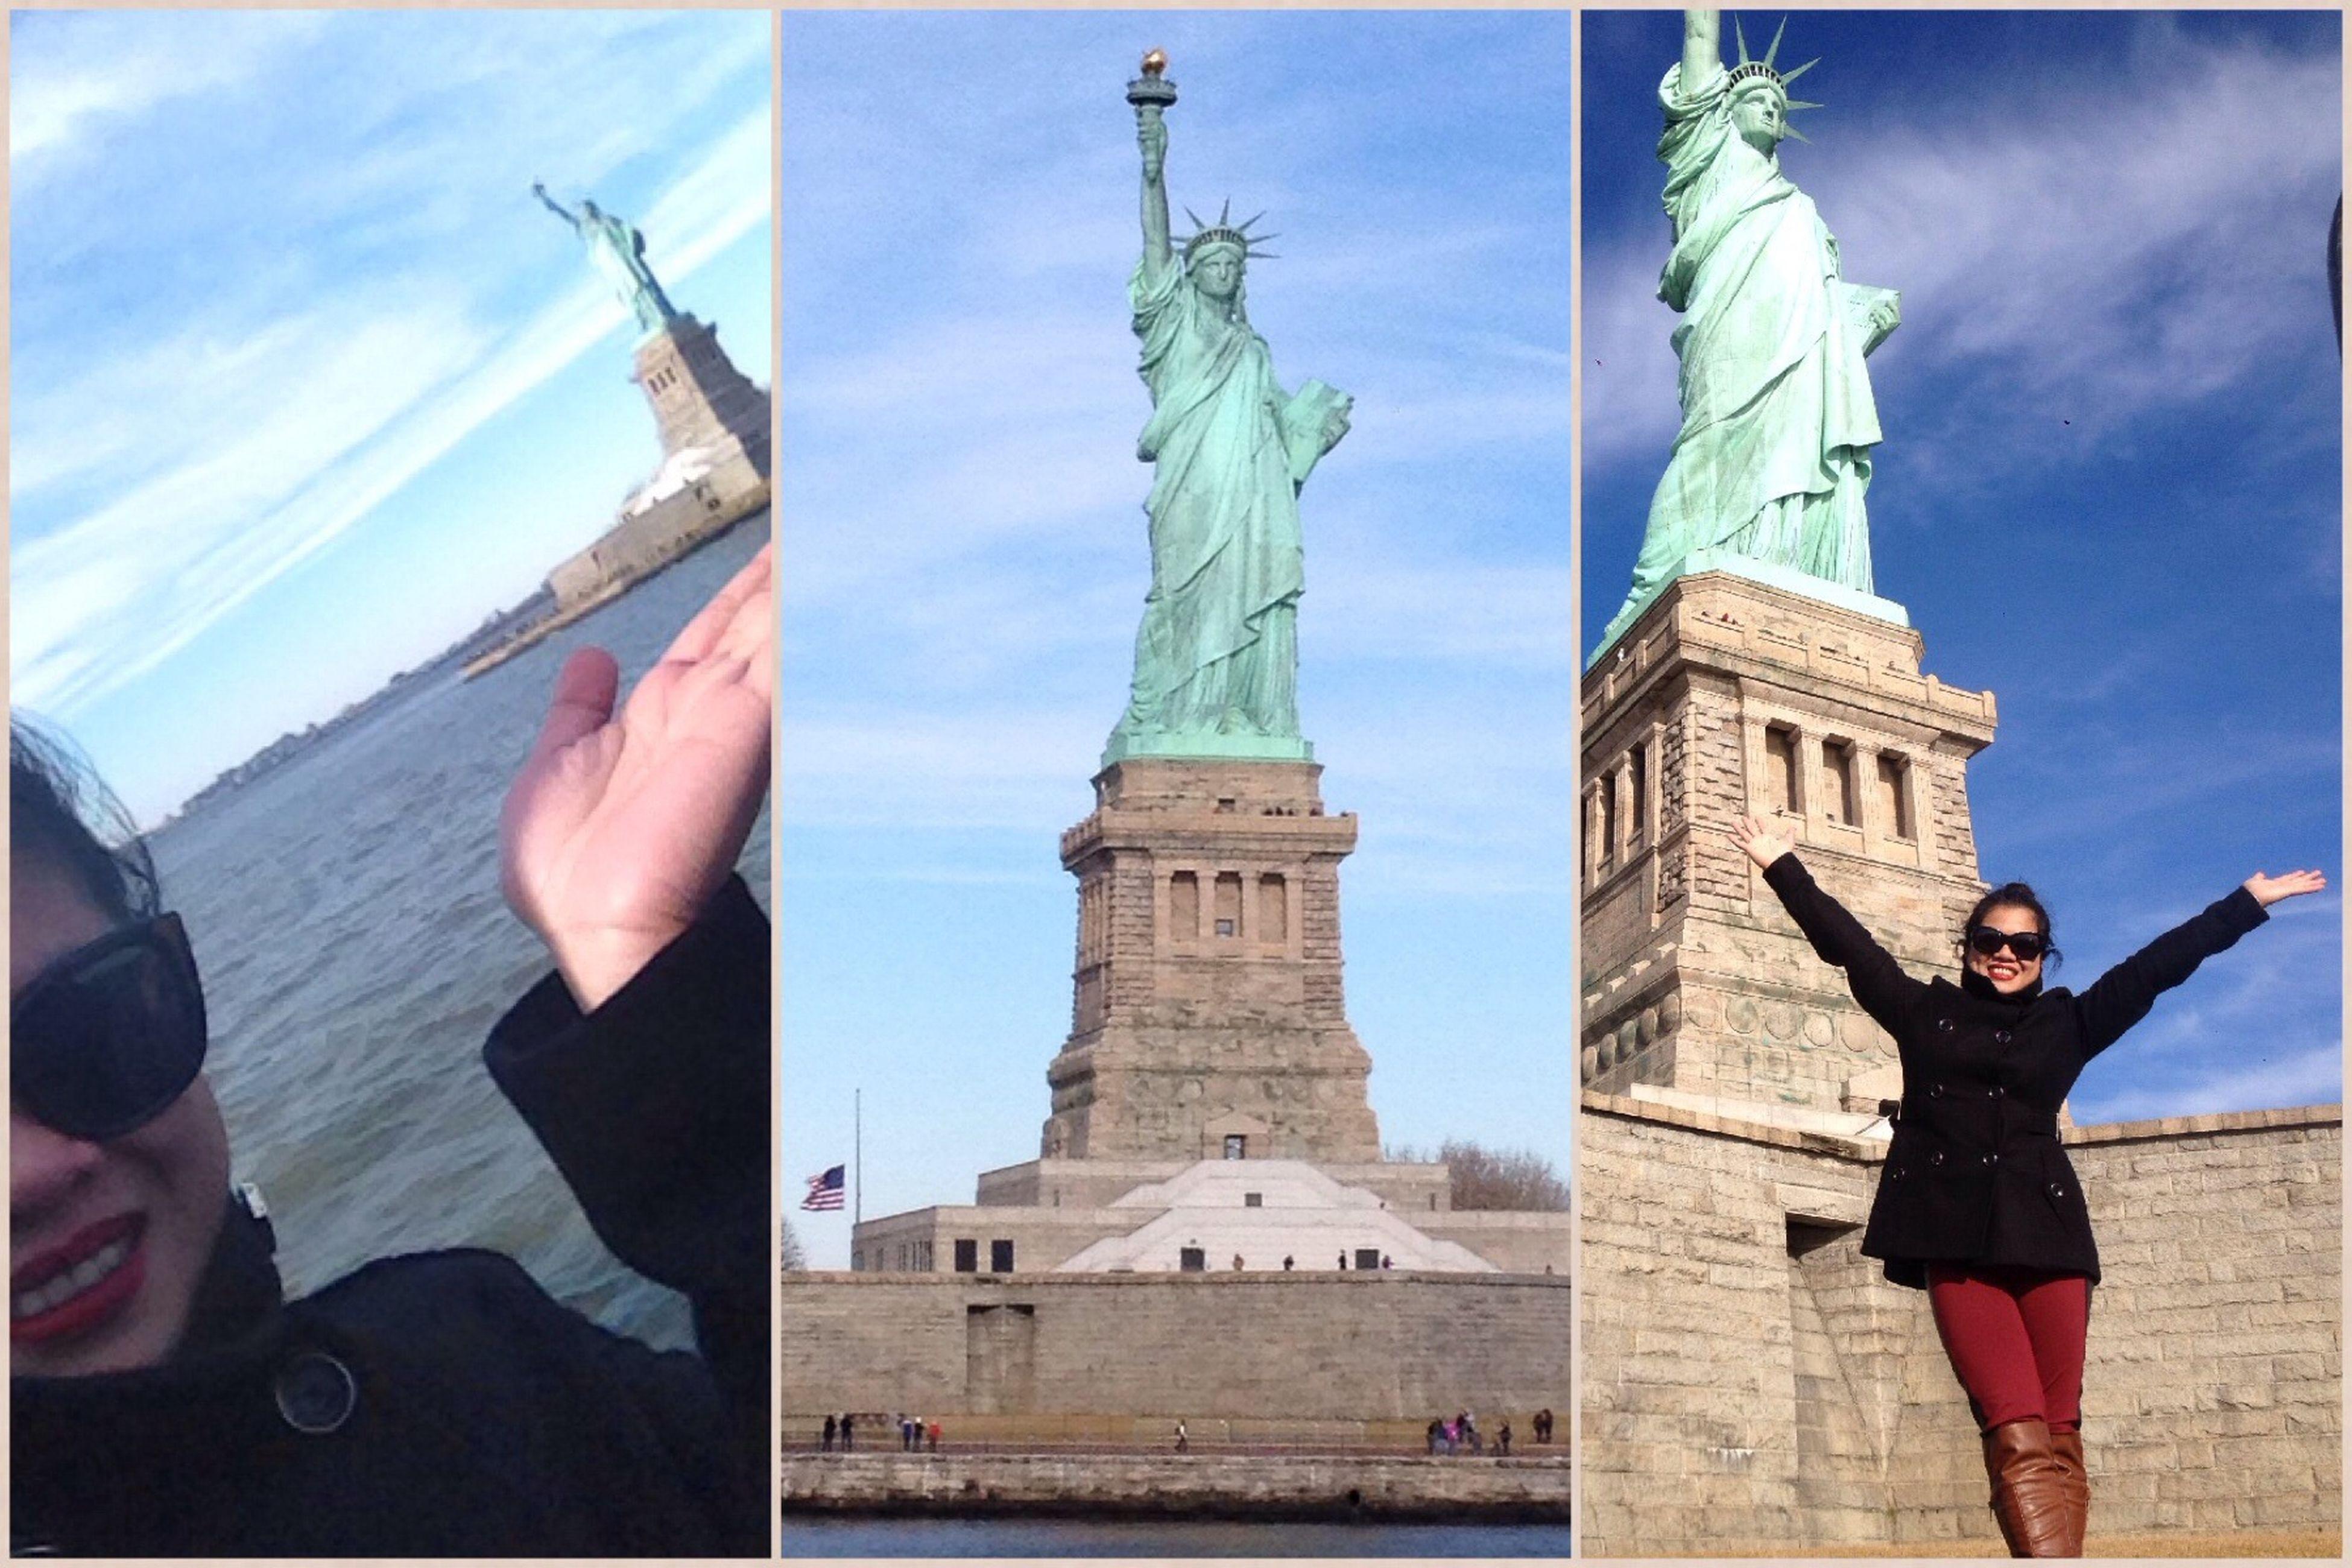 famous place, tourism, lifestyles, travel destinations, international landmark, architecture, sky, travel, built structure, men, human representation, person, statue, tourist, sculpture, leisure activity, building exterior, art and craft, capital cities